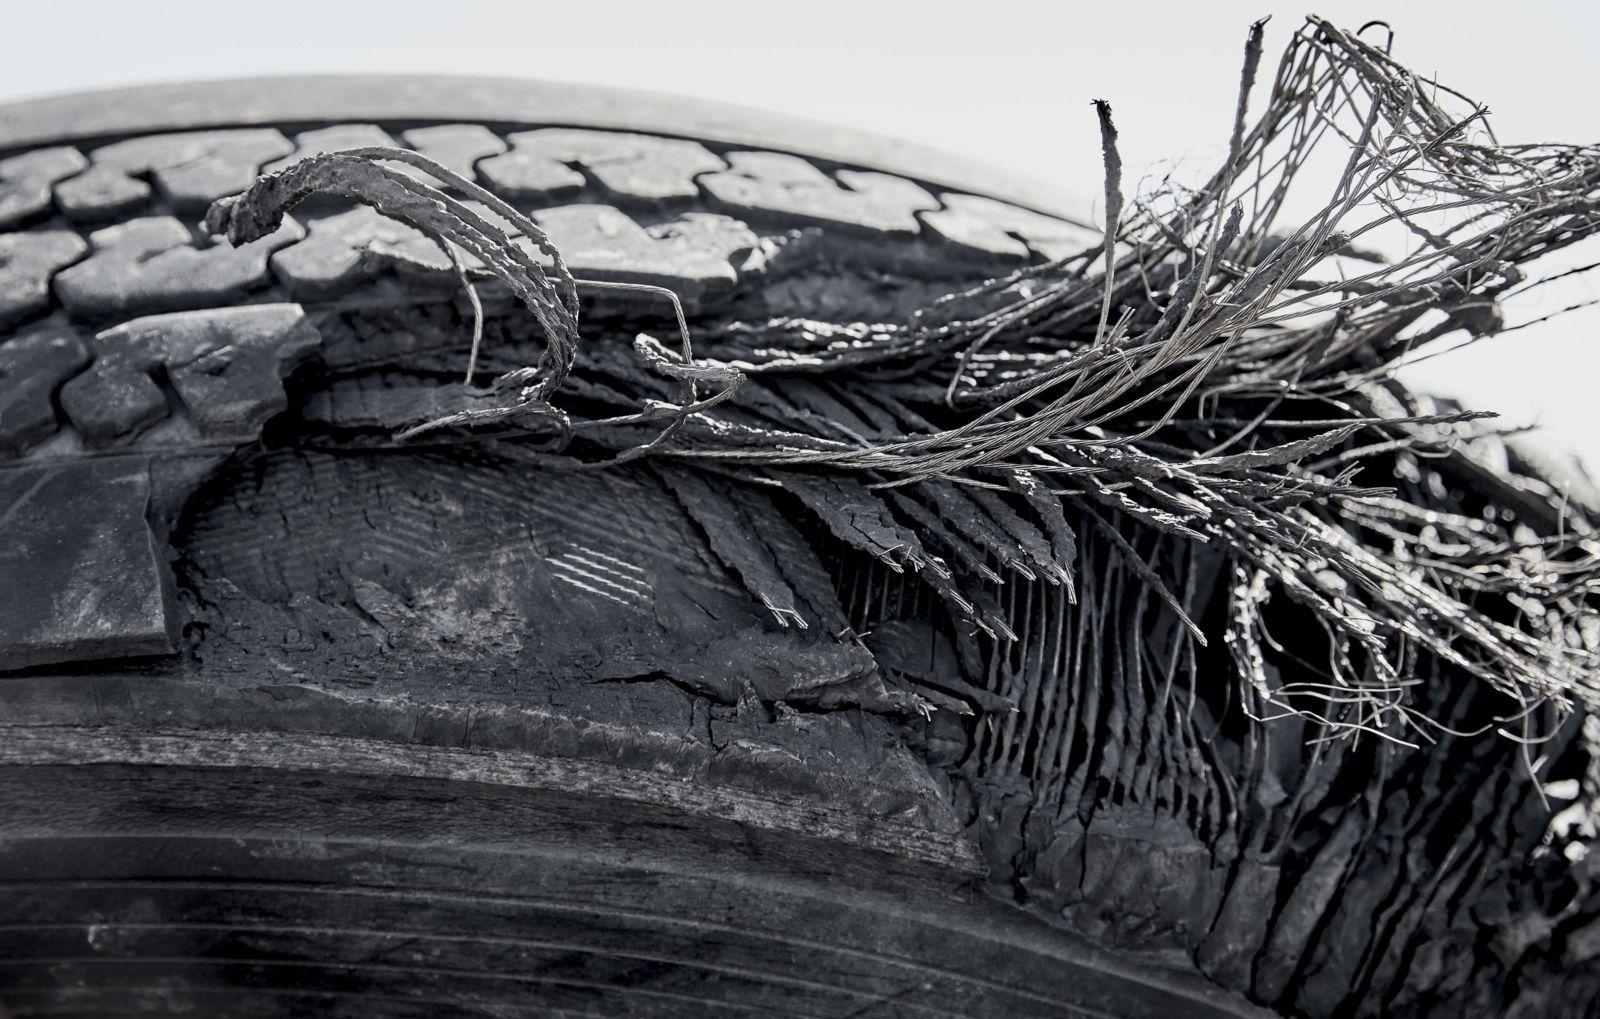 Truck Tire Debris